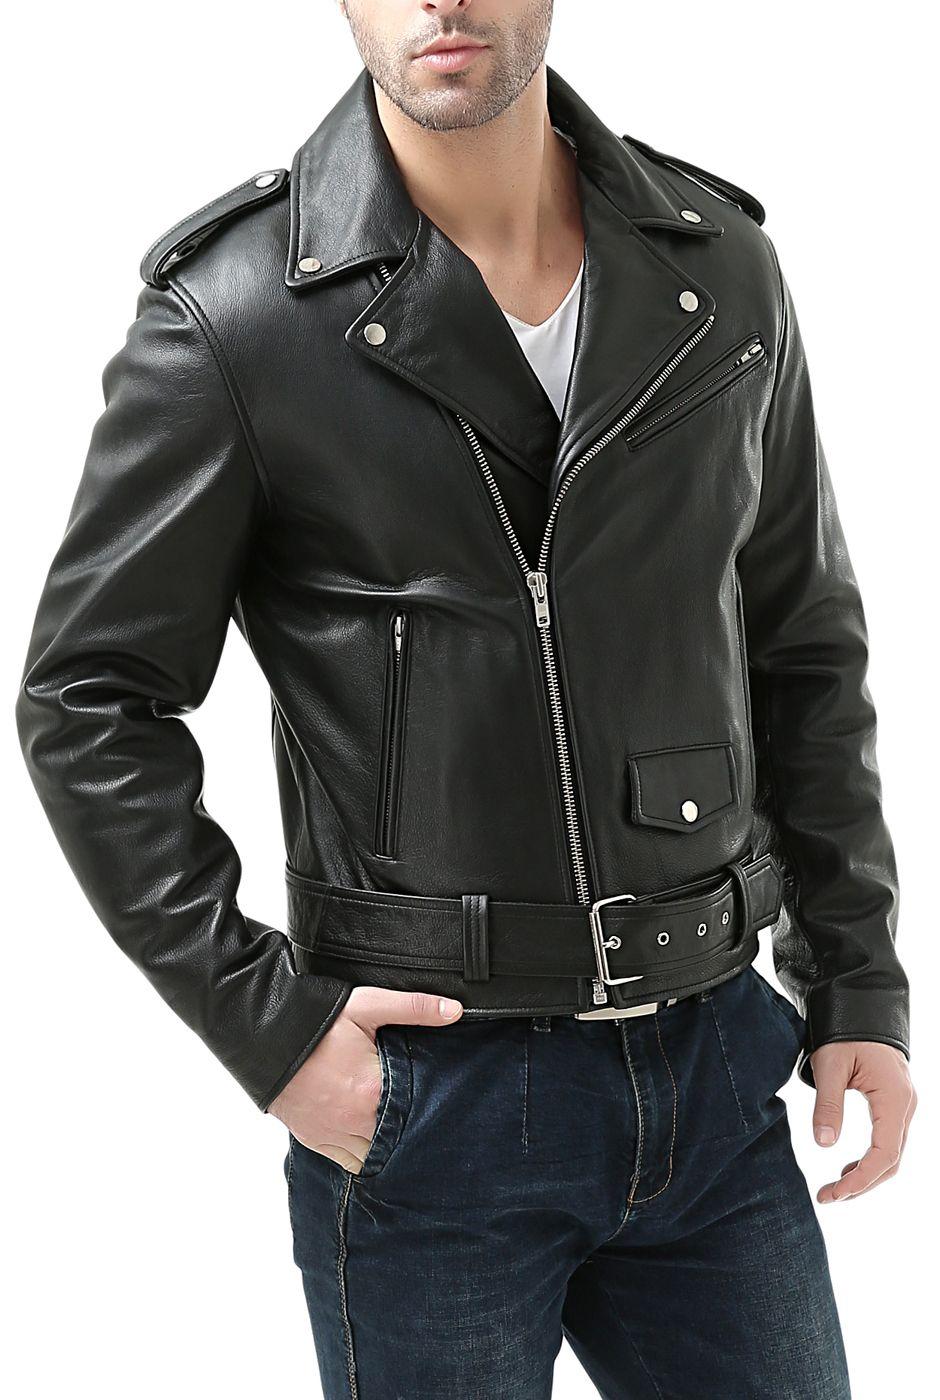 Pin By Camilo Mendivil Orellana On The Lost Wardrobe Jackets Men Fashion Leather Jacket Style Leather Jacket Men [ jpg ]